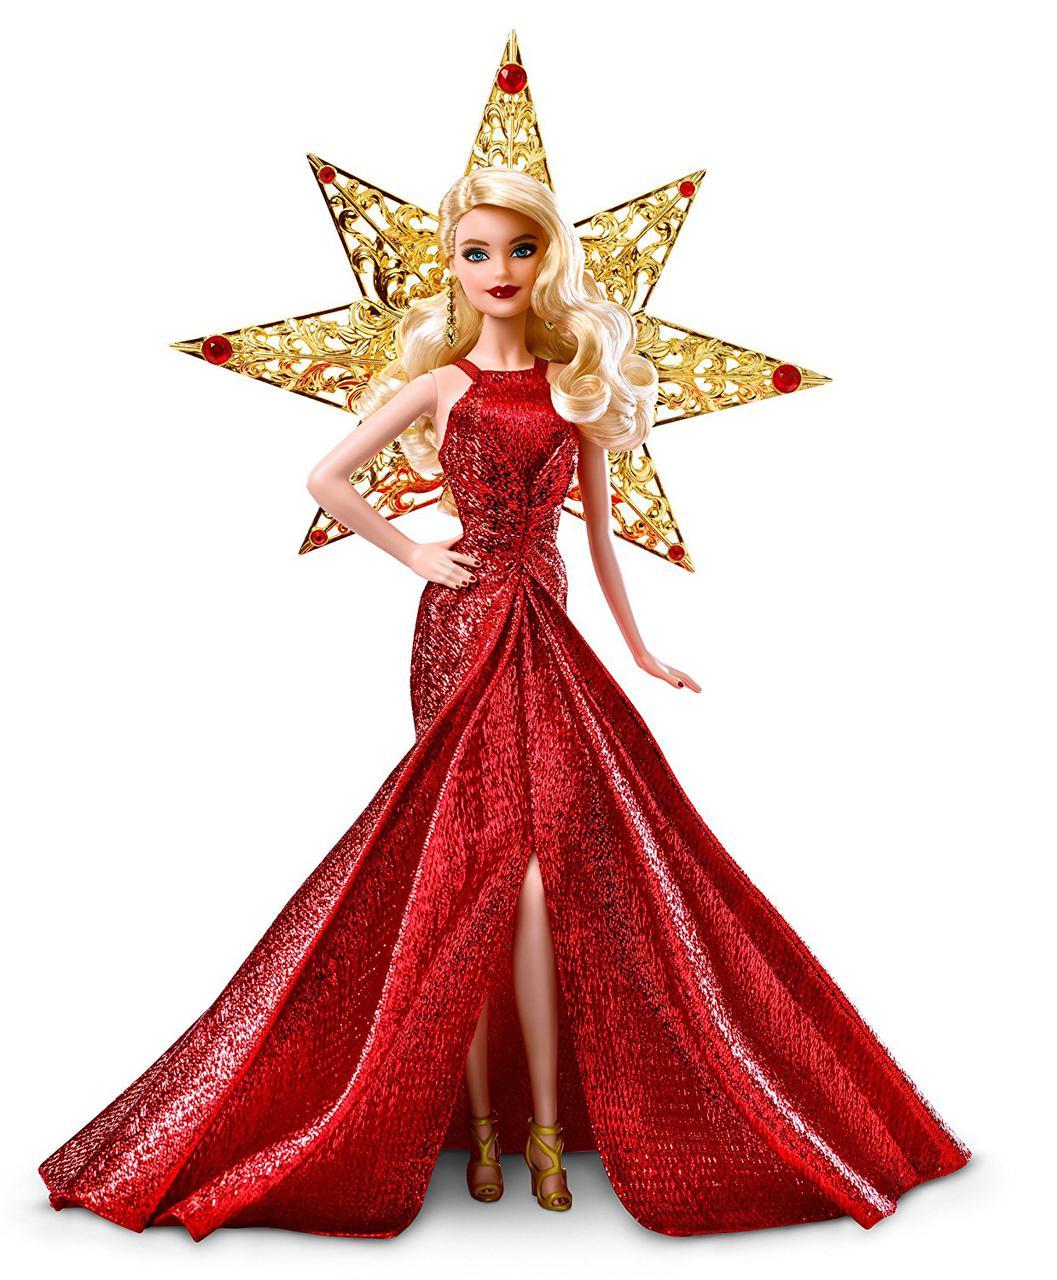 Коллекционная кукла Барби праздничная 2017 Блондинка Barbie Holiday Blonde Hair